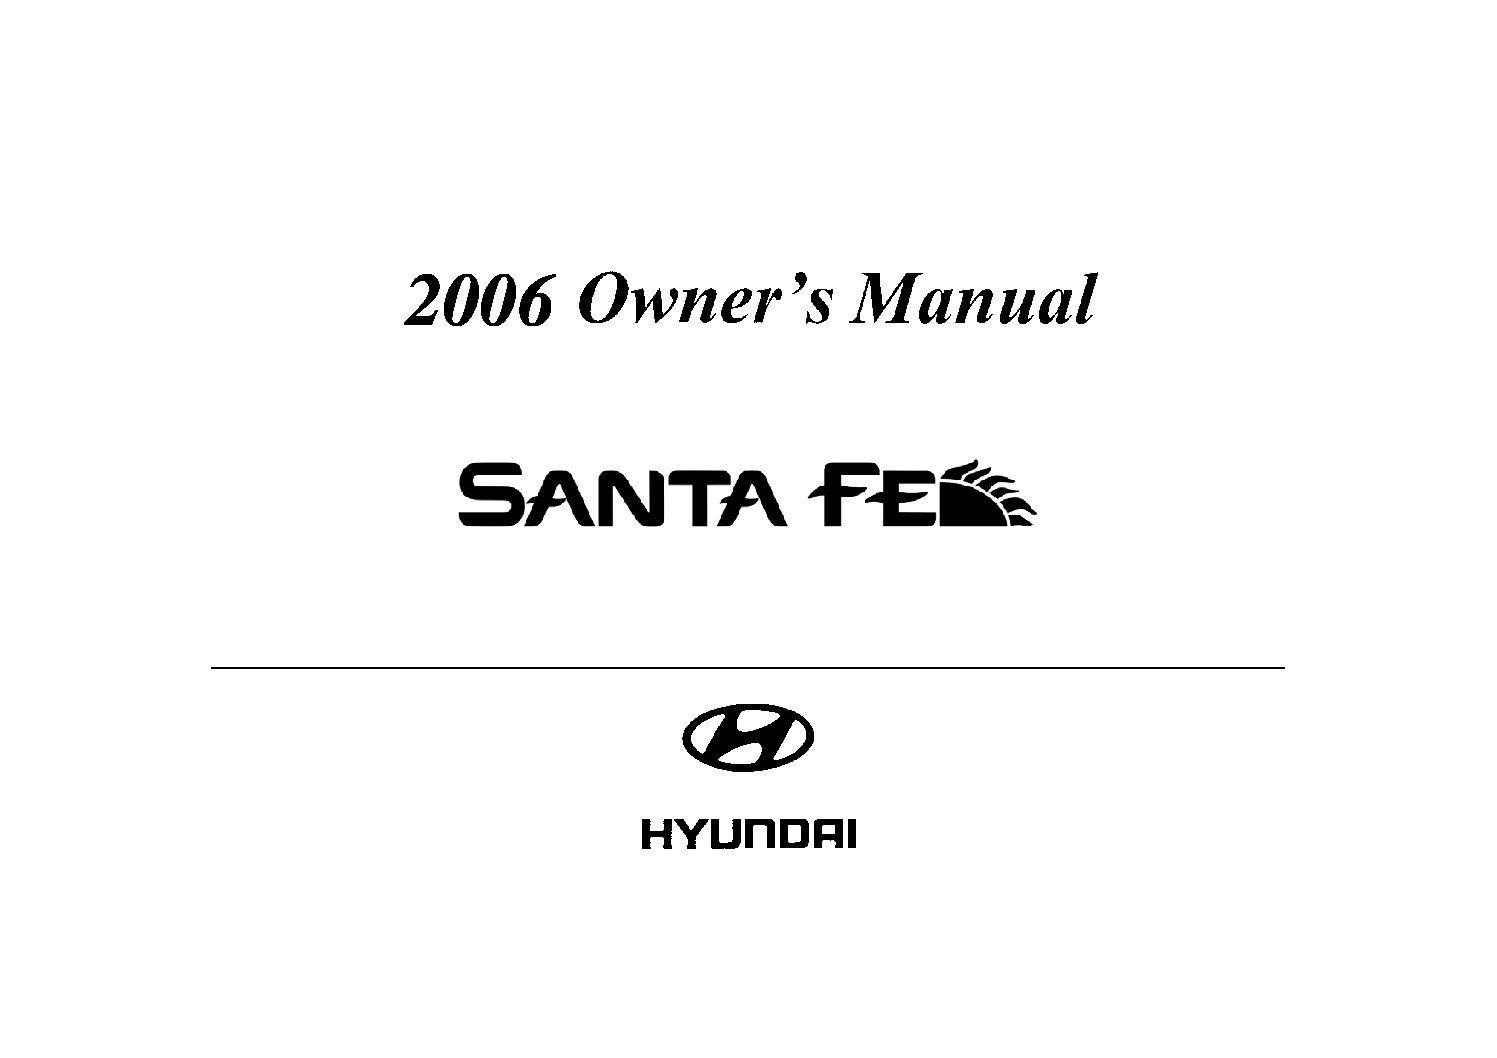 2006 hyundai santa fe owners manual just give me the damn manual rh justgivemethedamnmanual com 2015 hyundai santa fe owners manual pdf 2012 hyundai santa fe service manual pdf